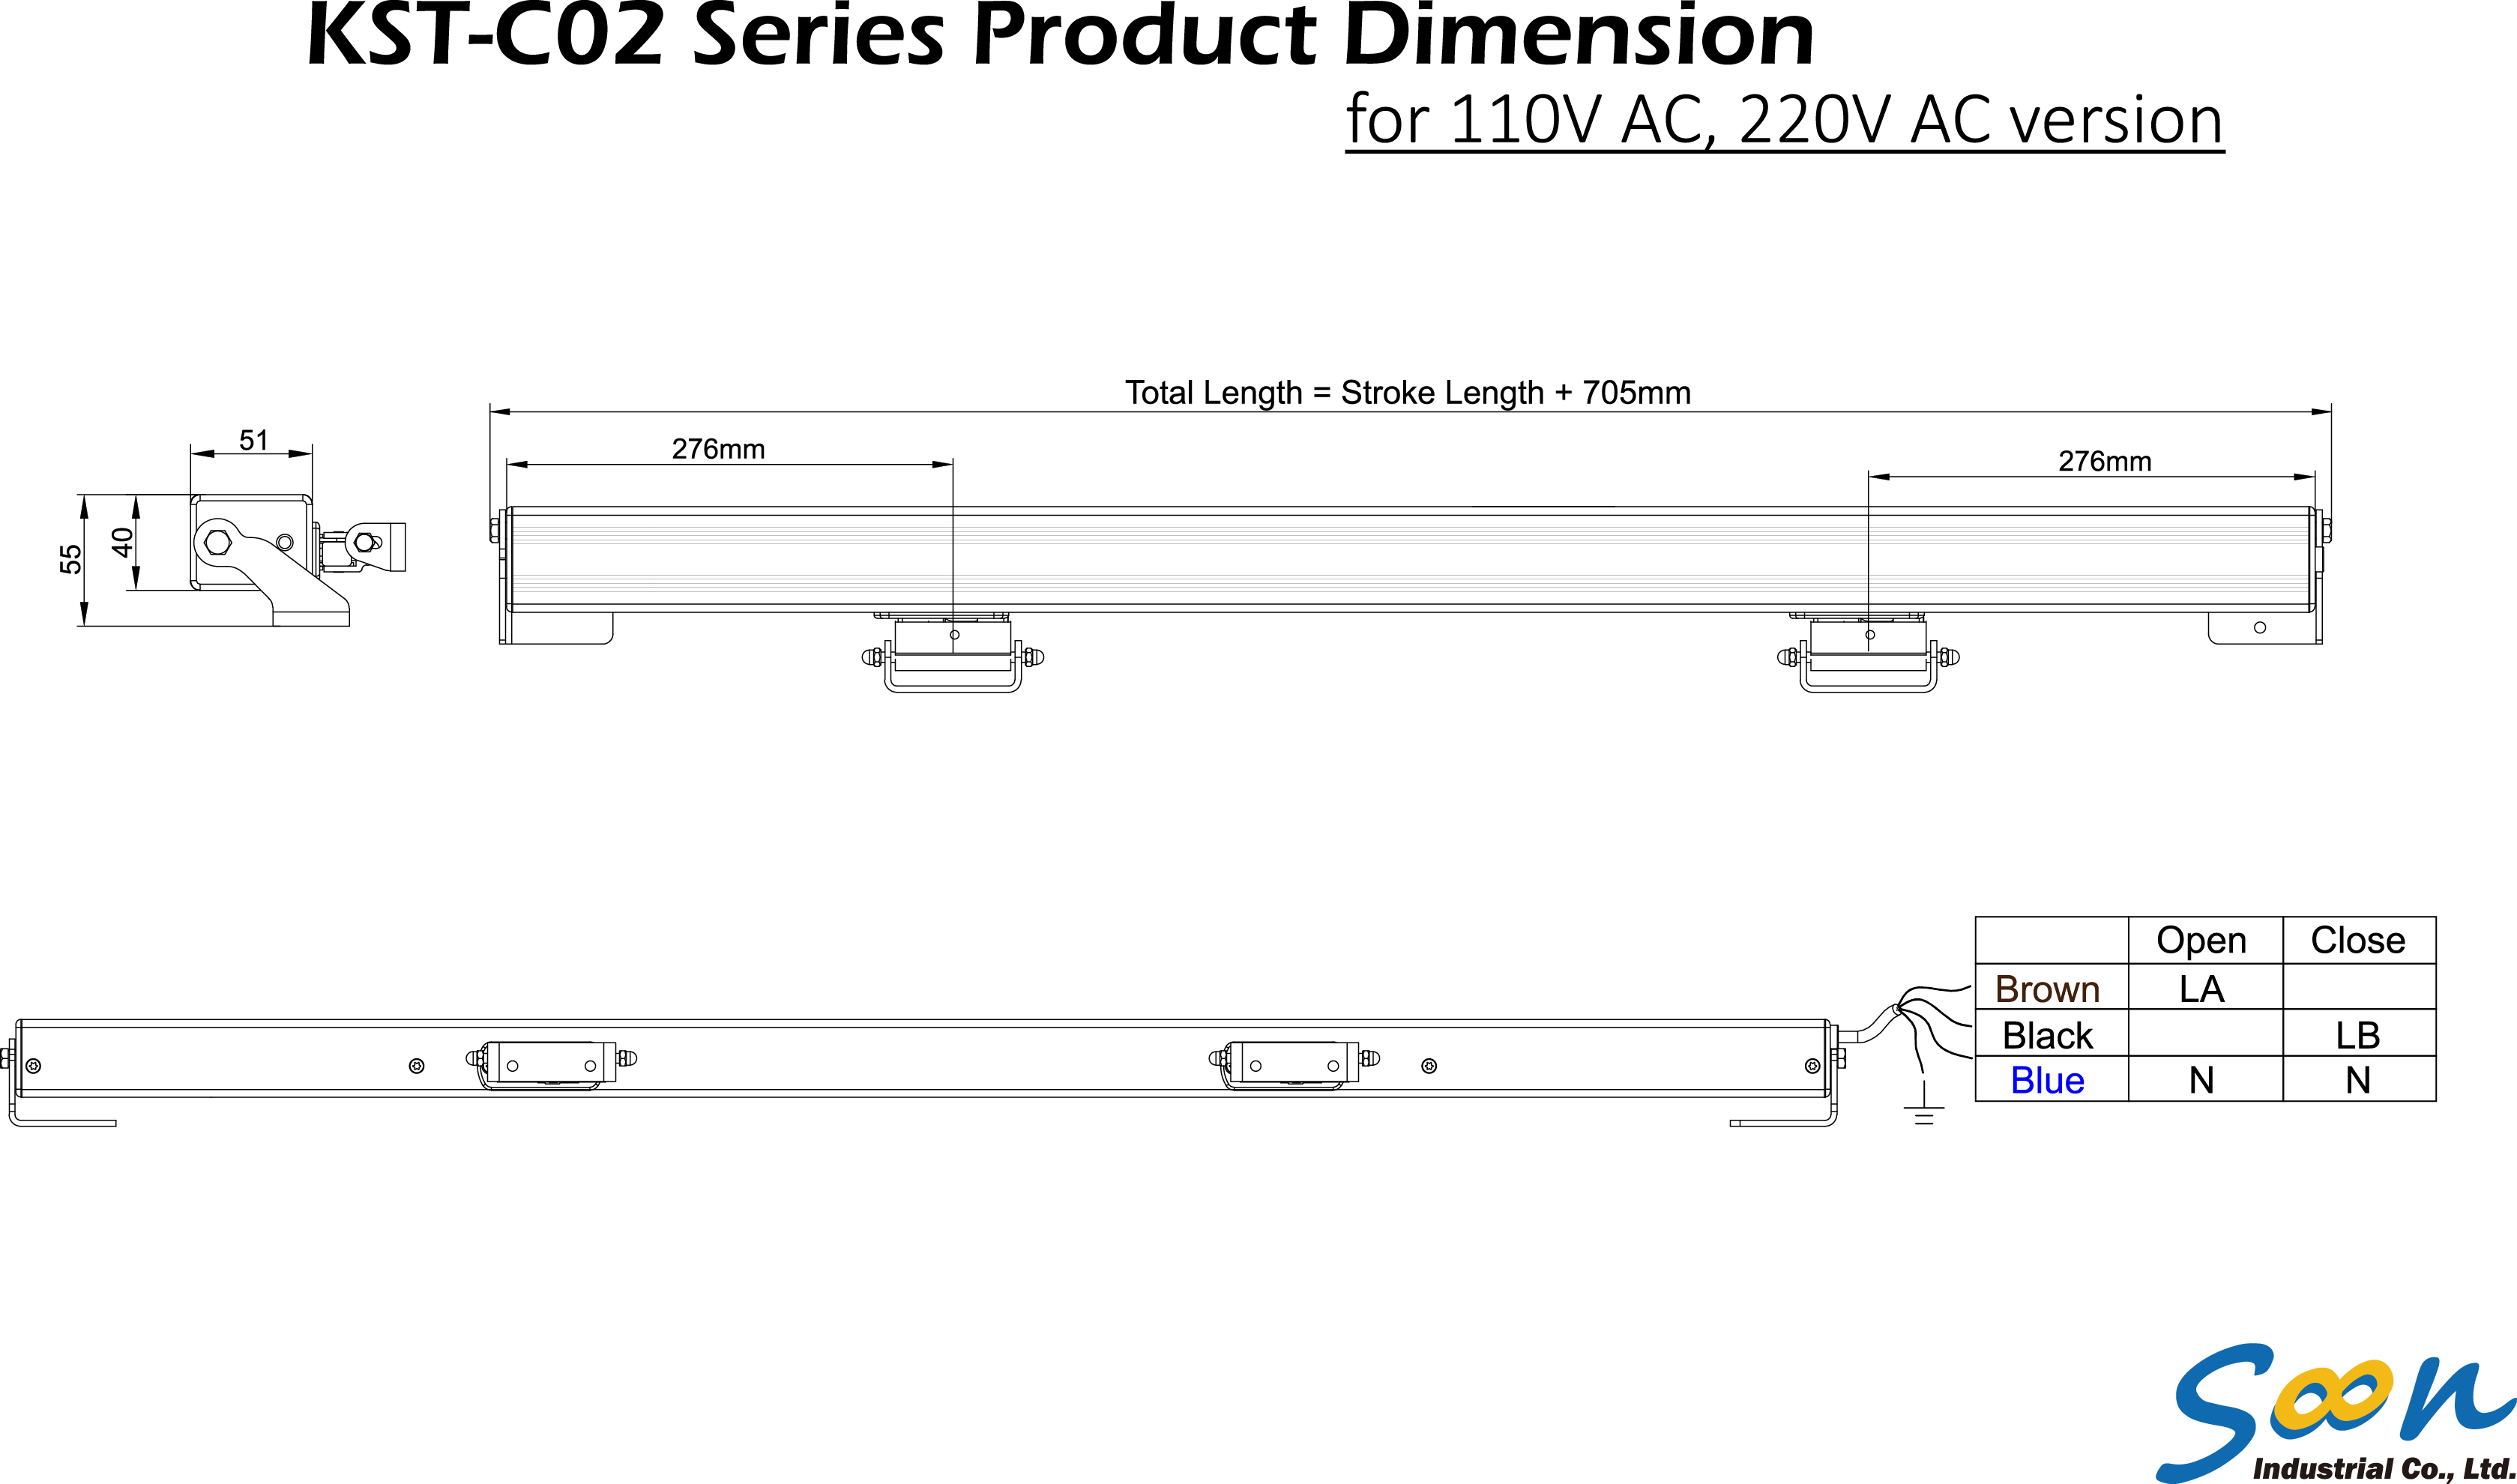 KST-C02 - AC -  line drawing